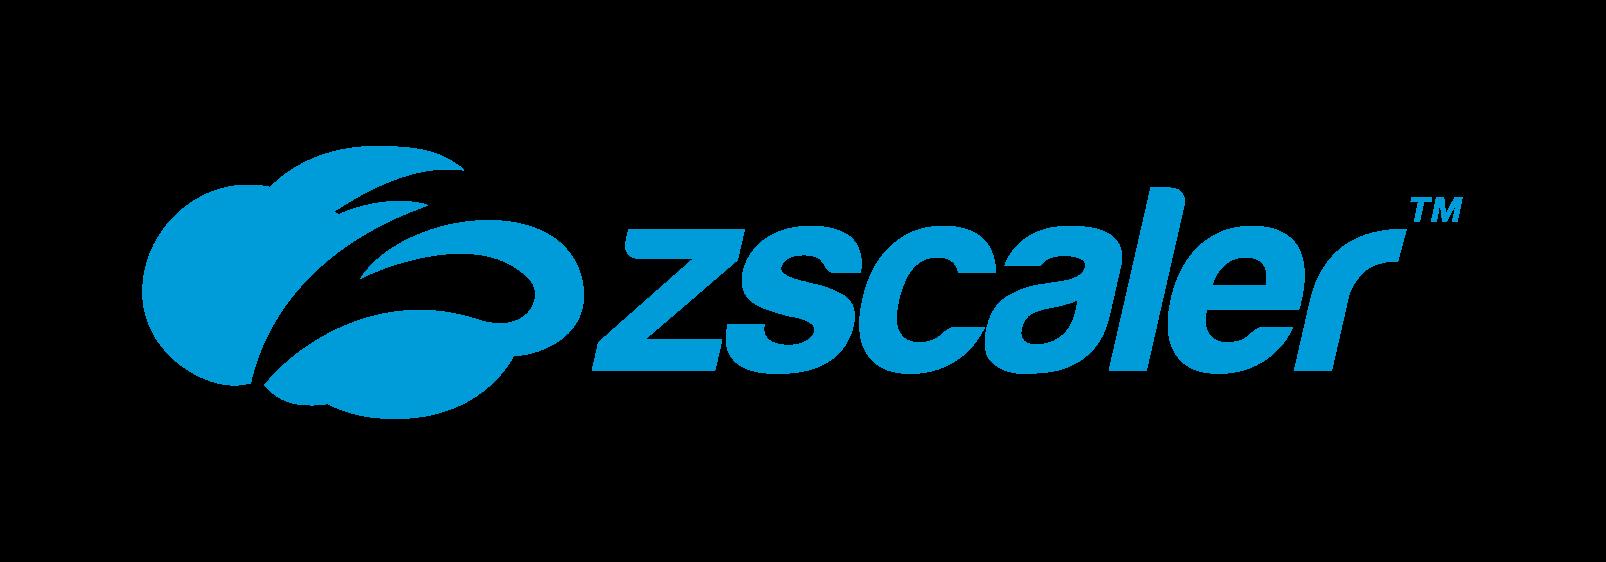 Zscaler-Logo-TM-Blue-RGB-20Dec2016